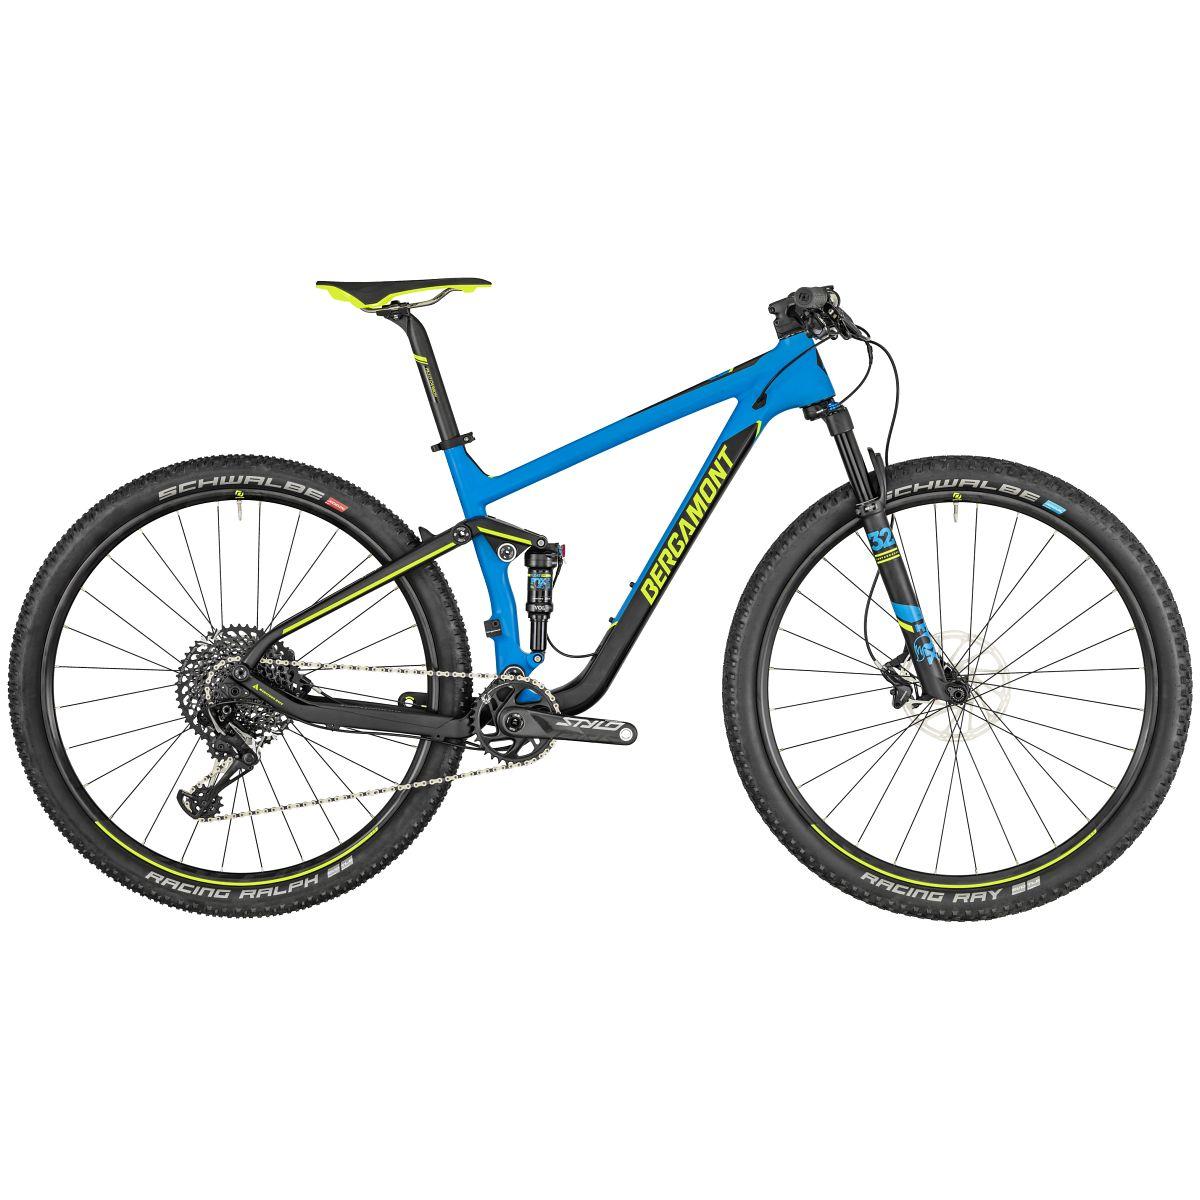 bergamont fastlane team 29 39 39 carbon mtb fahrrad blau. Black Bedroom Furniture Sets. Home Design Ideas